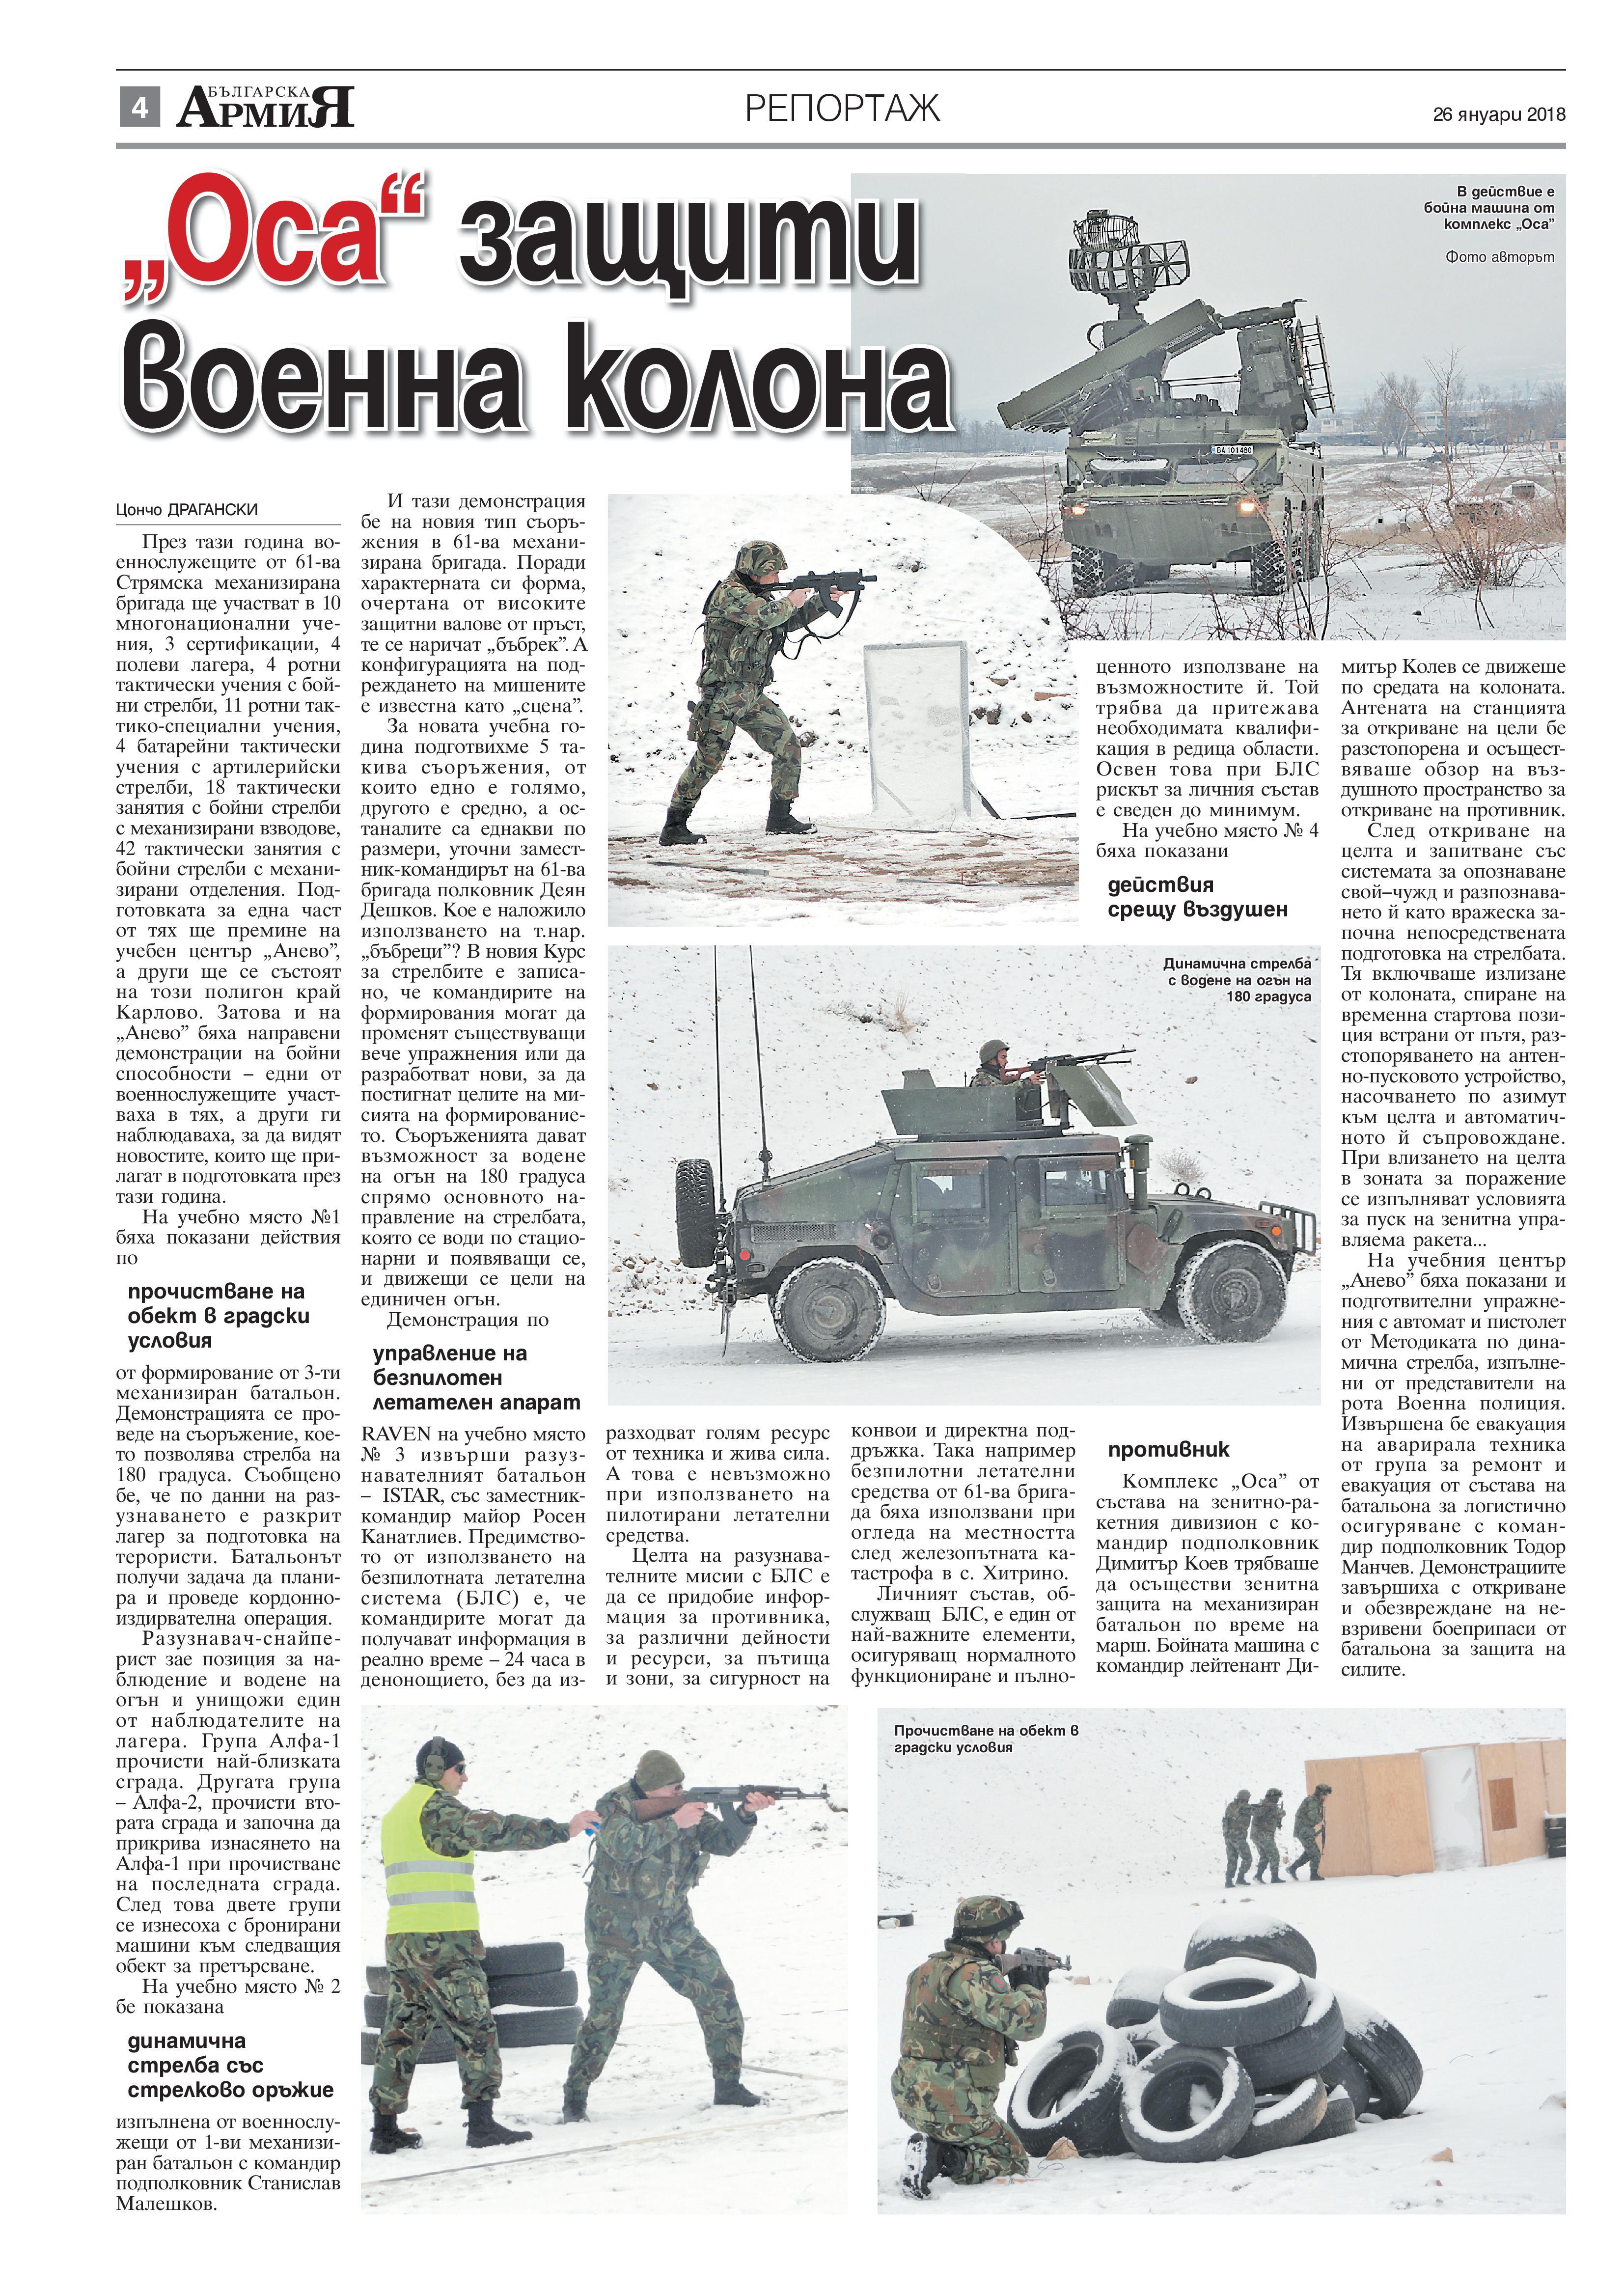 https://armymedia.bg/wp-content/uploads/2015/06/04-17.jpg